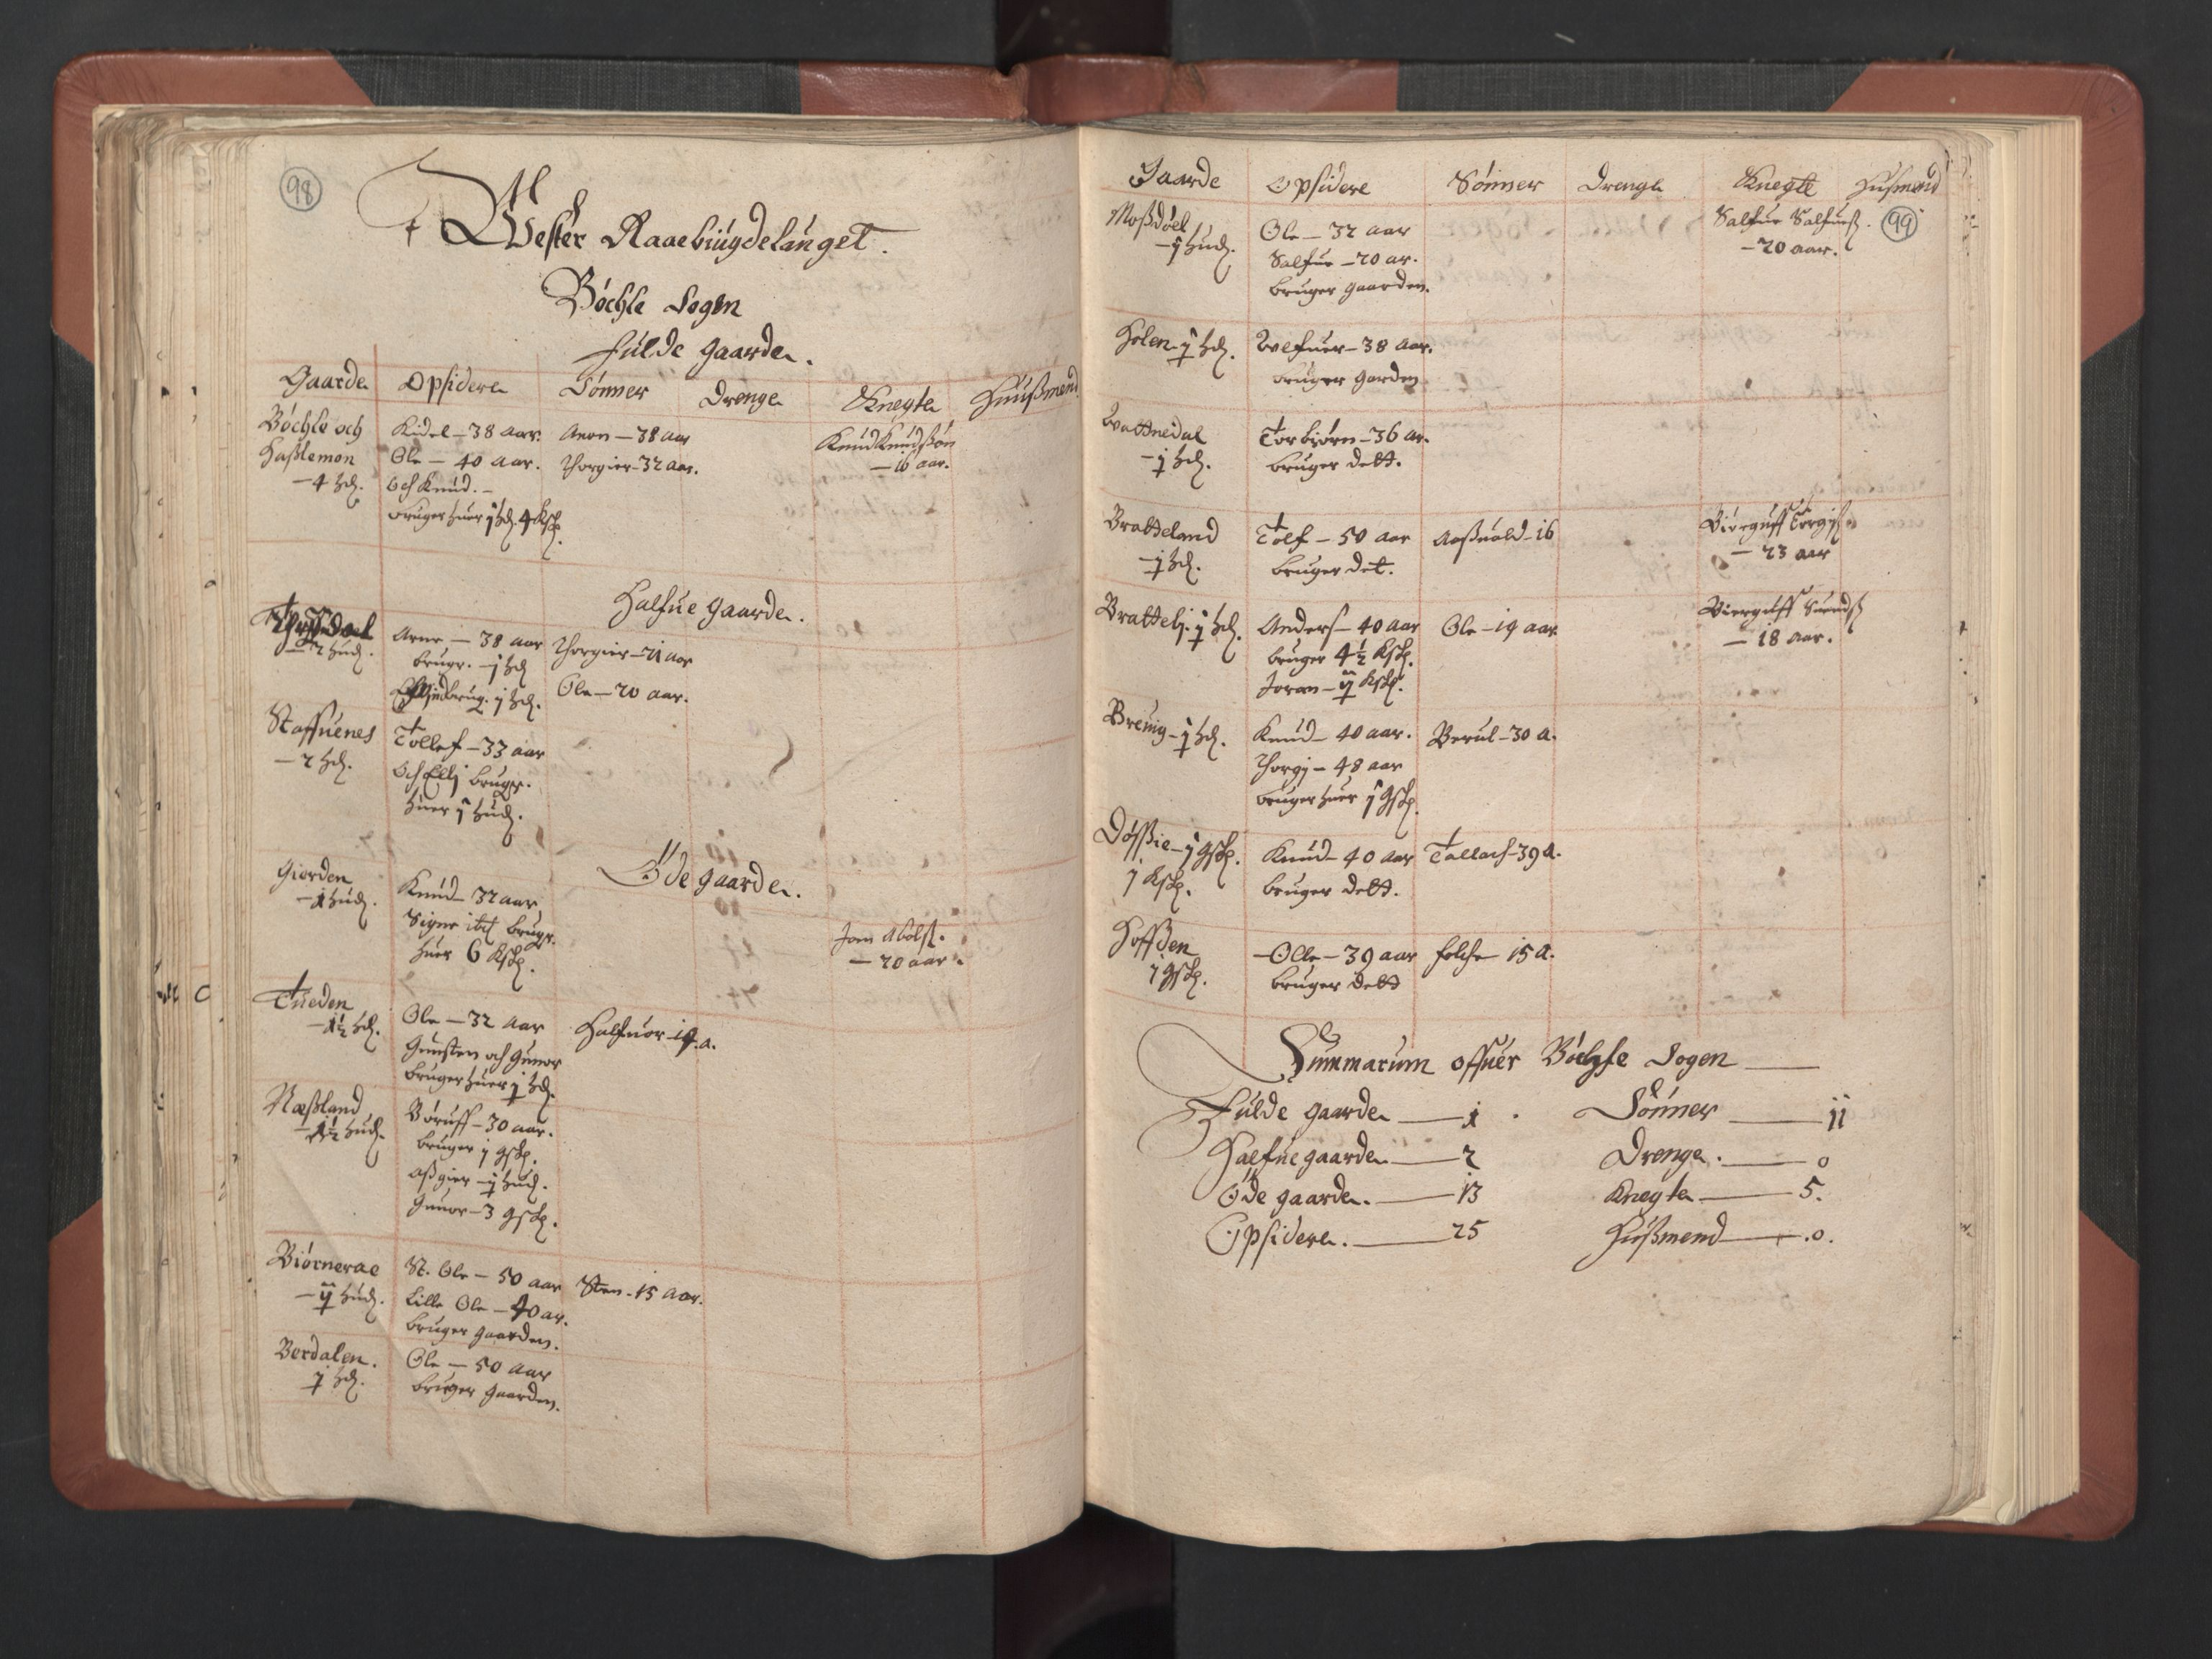 RA, Fogdenes og sorenskrivernes manntall 1664-1666, nr. 8: Råbyggelaget fogderi, 1664-1665, s. 98-99